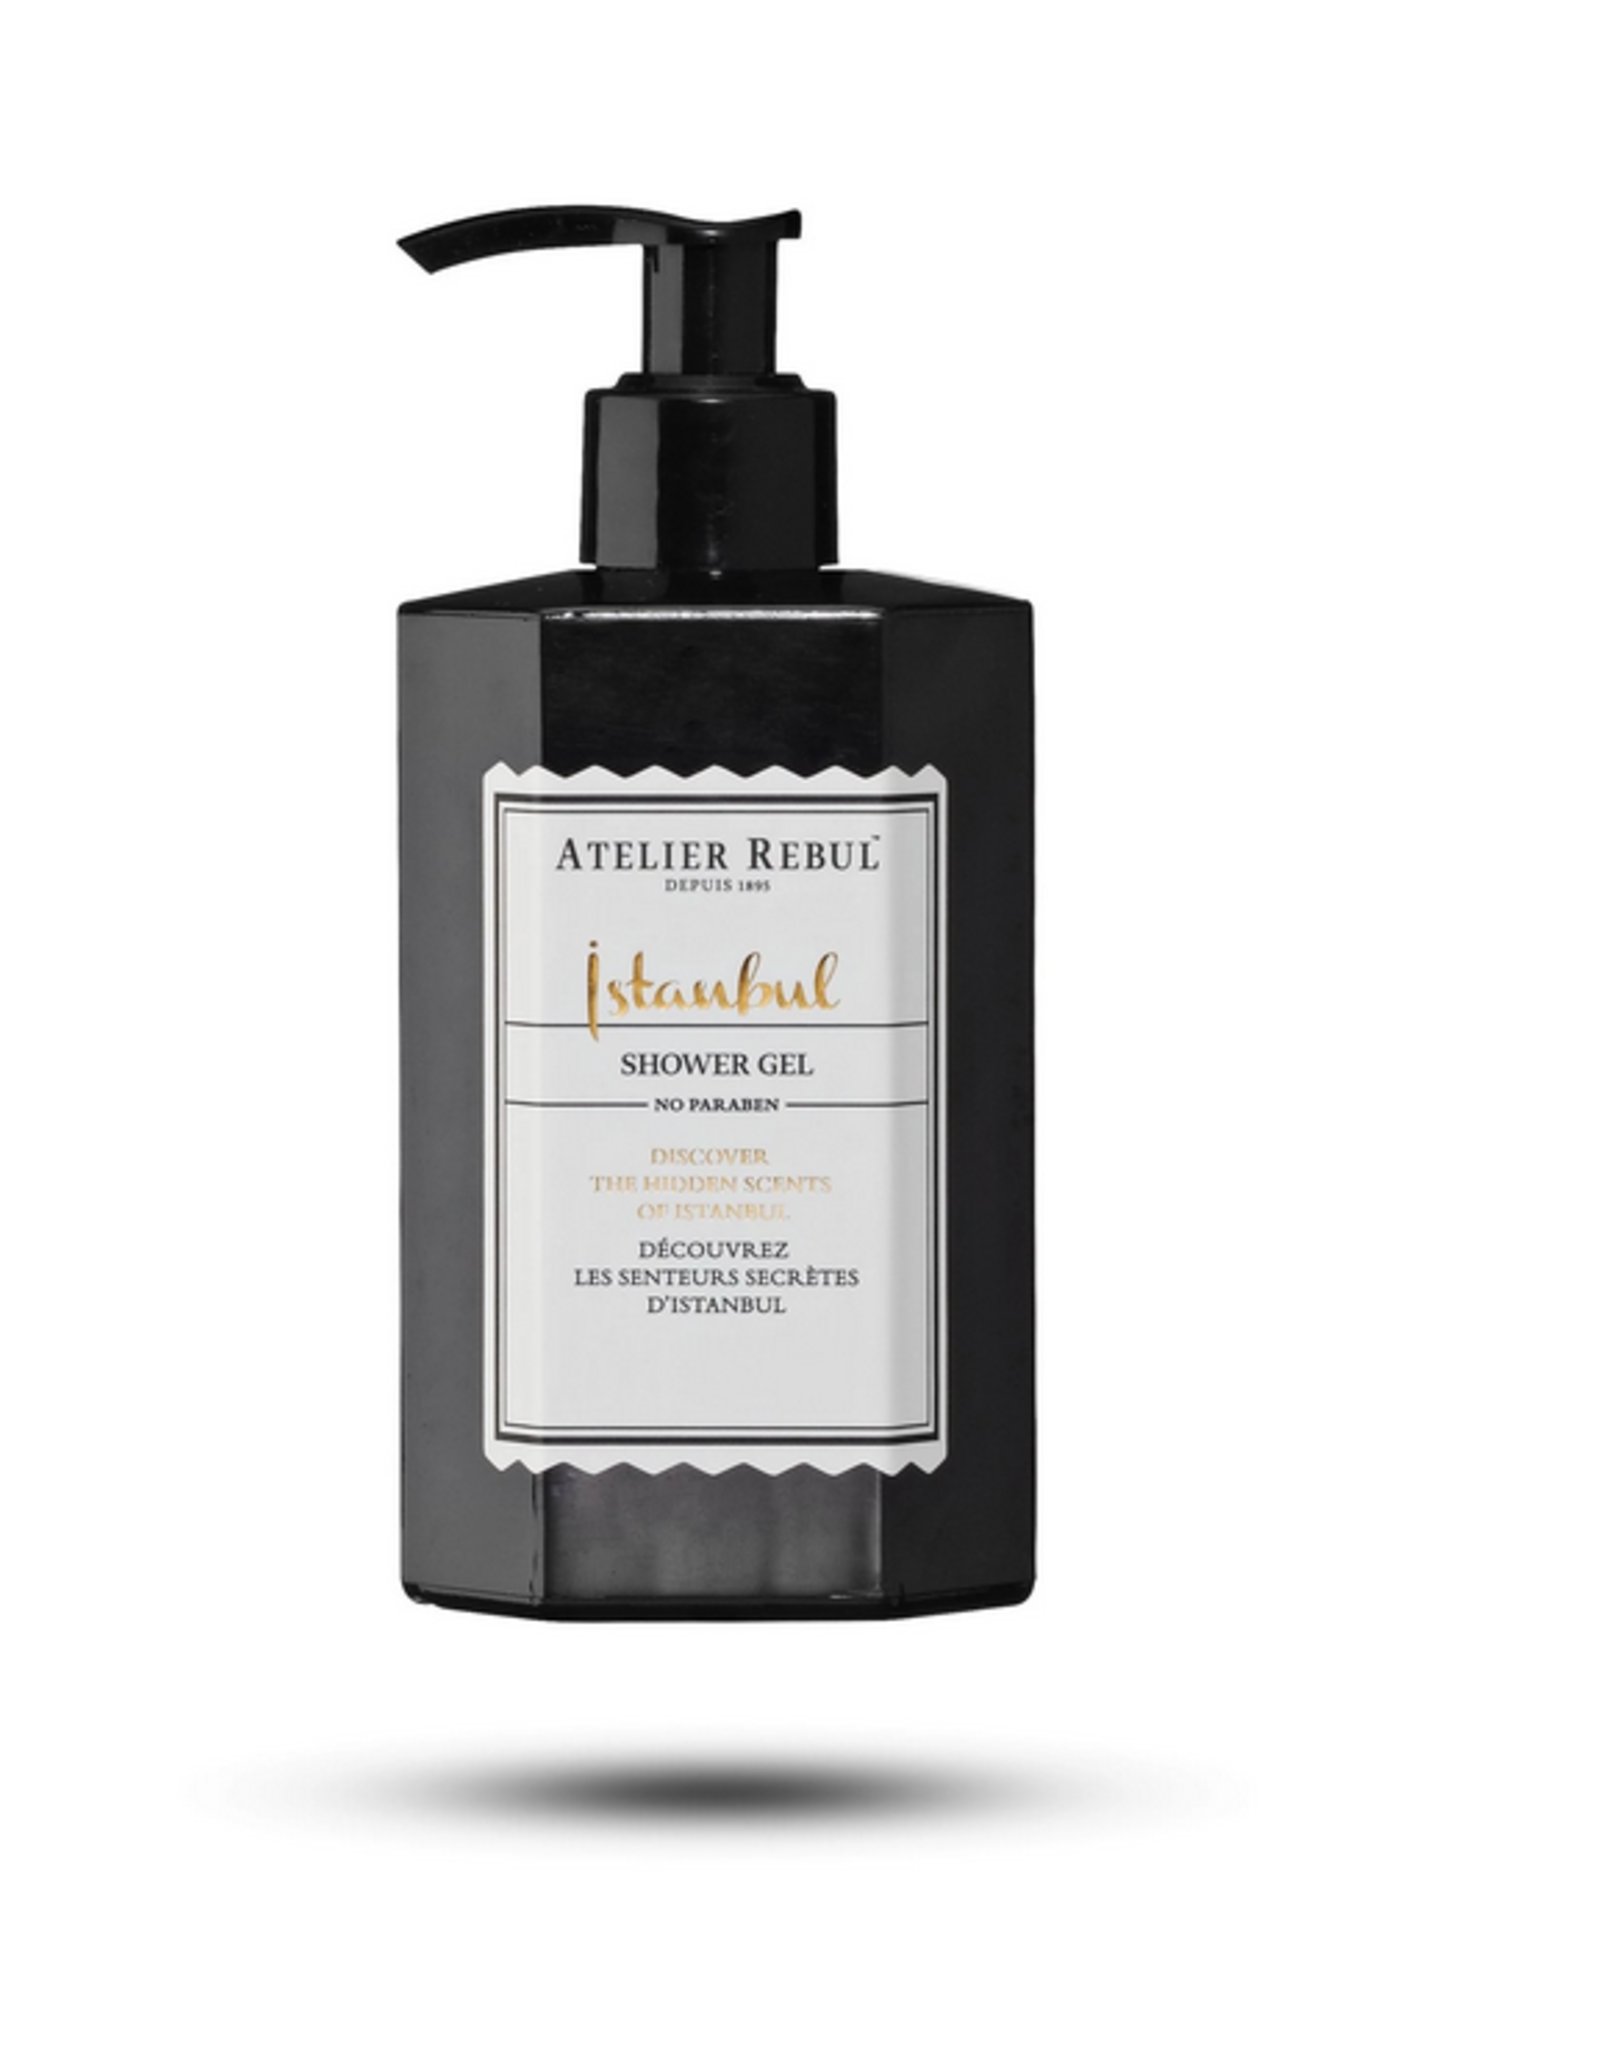 Atelier Rebul Atelier Rebul - Istanbul Shower gel - 430 ml